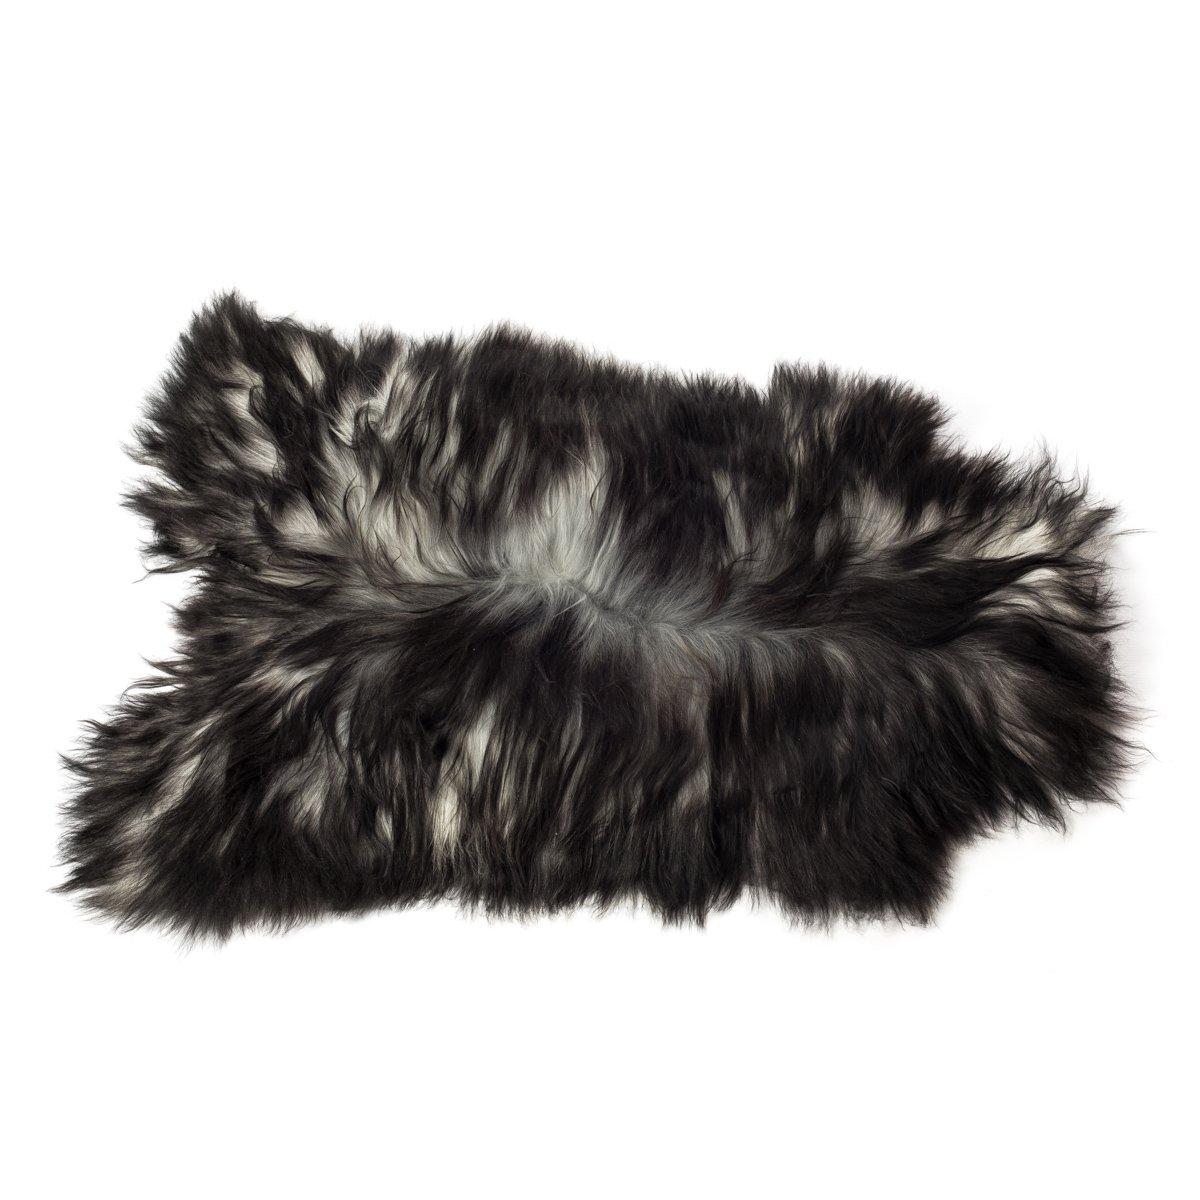 Iceland Long Haired Sheepskin 110 x 70cm